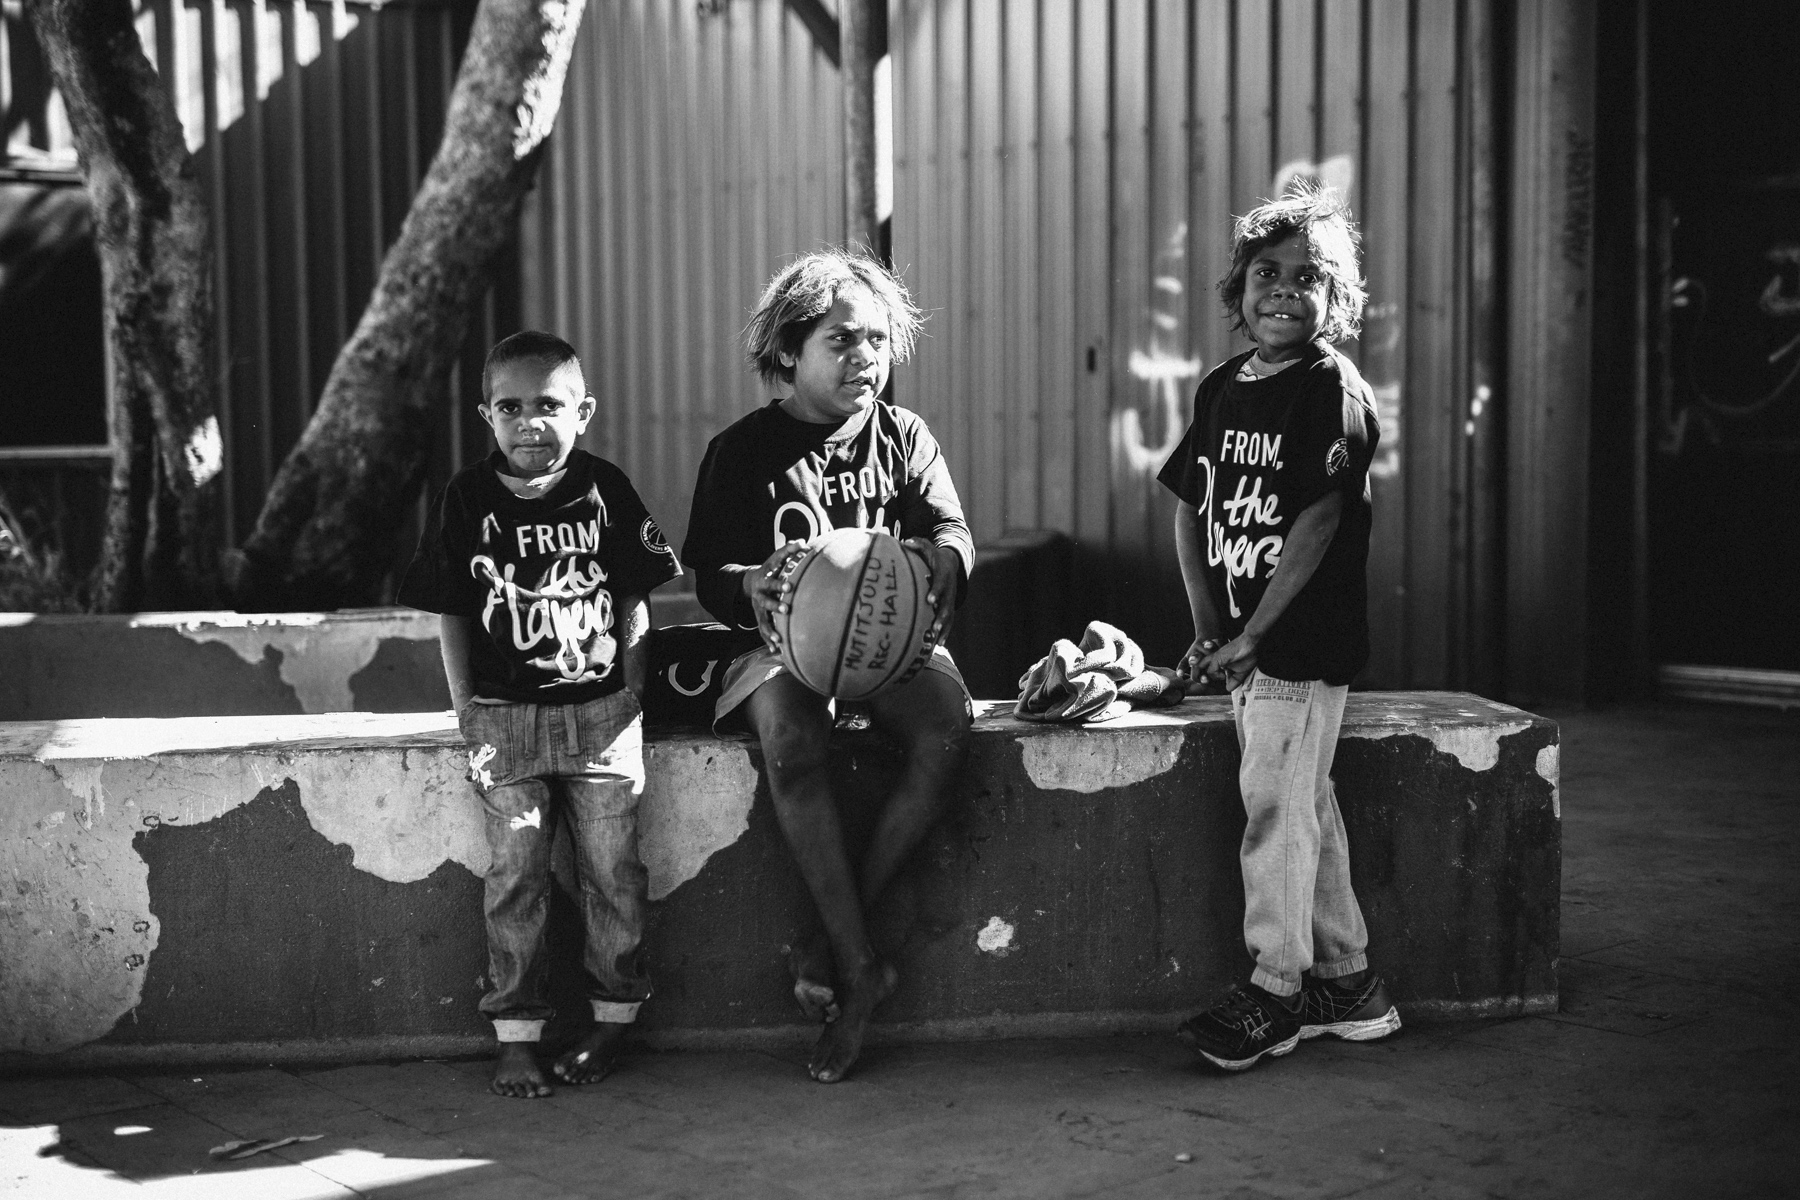 Uluru+boomers+++-35.jpg